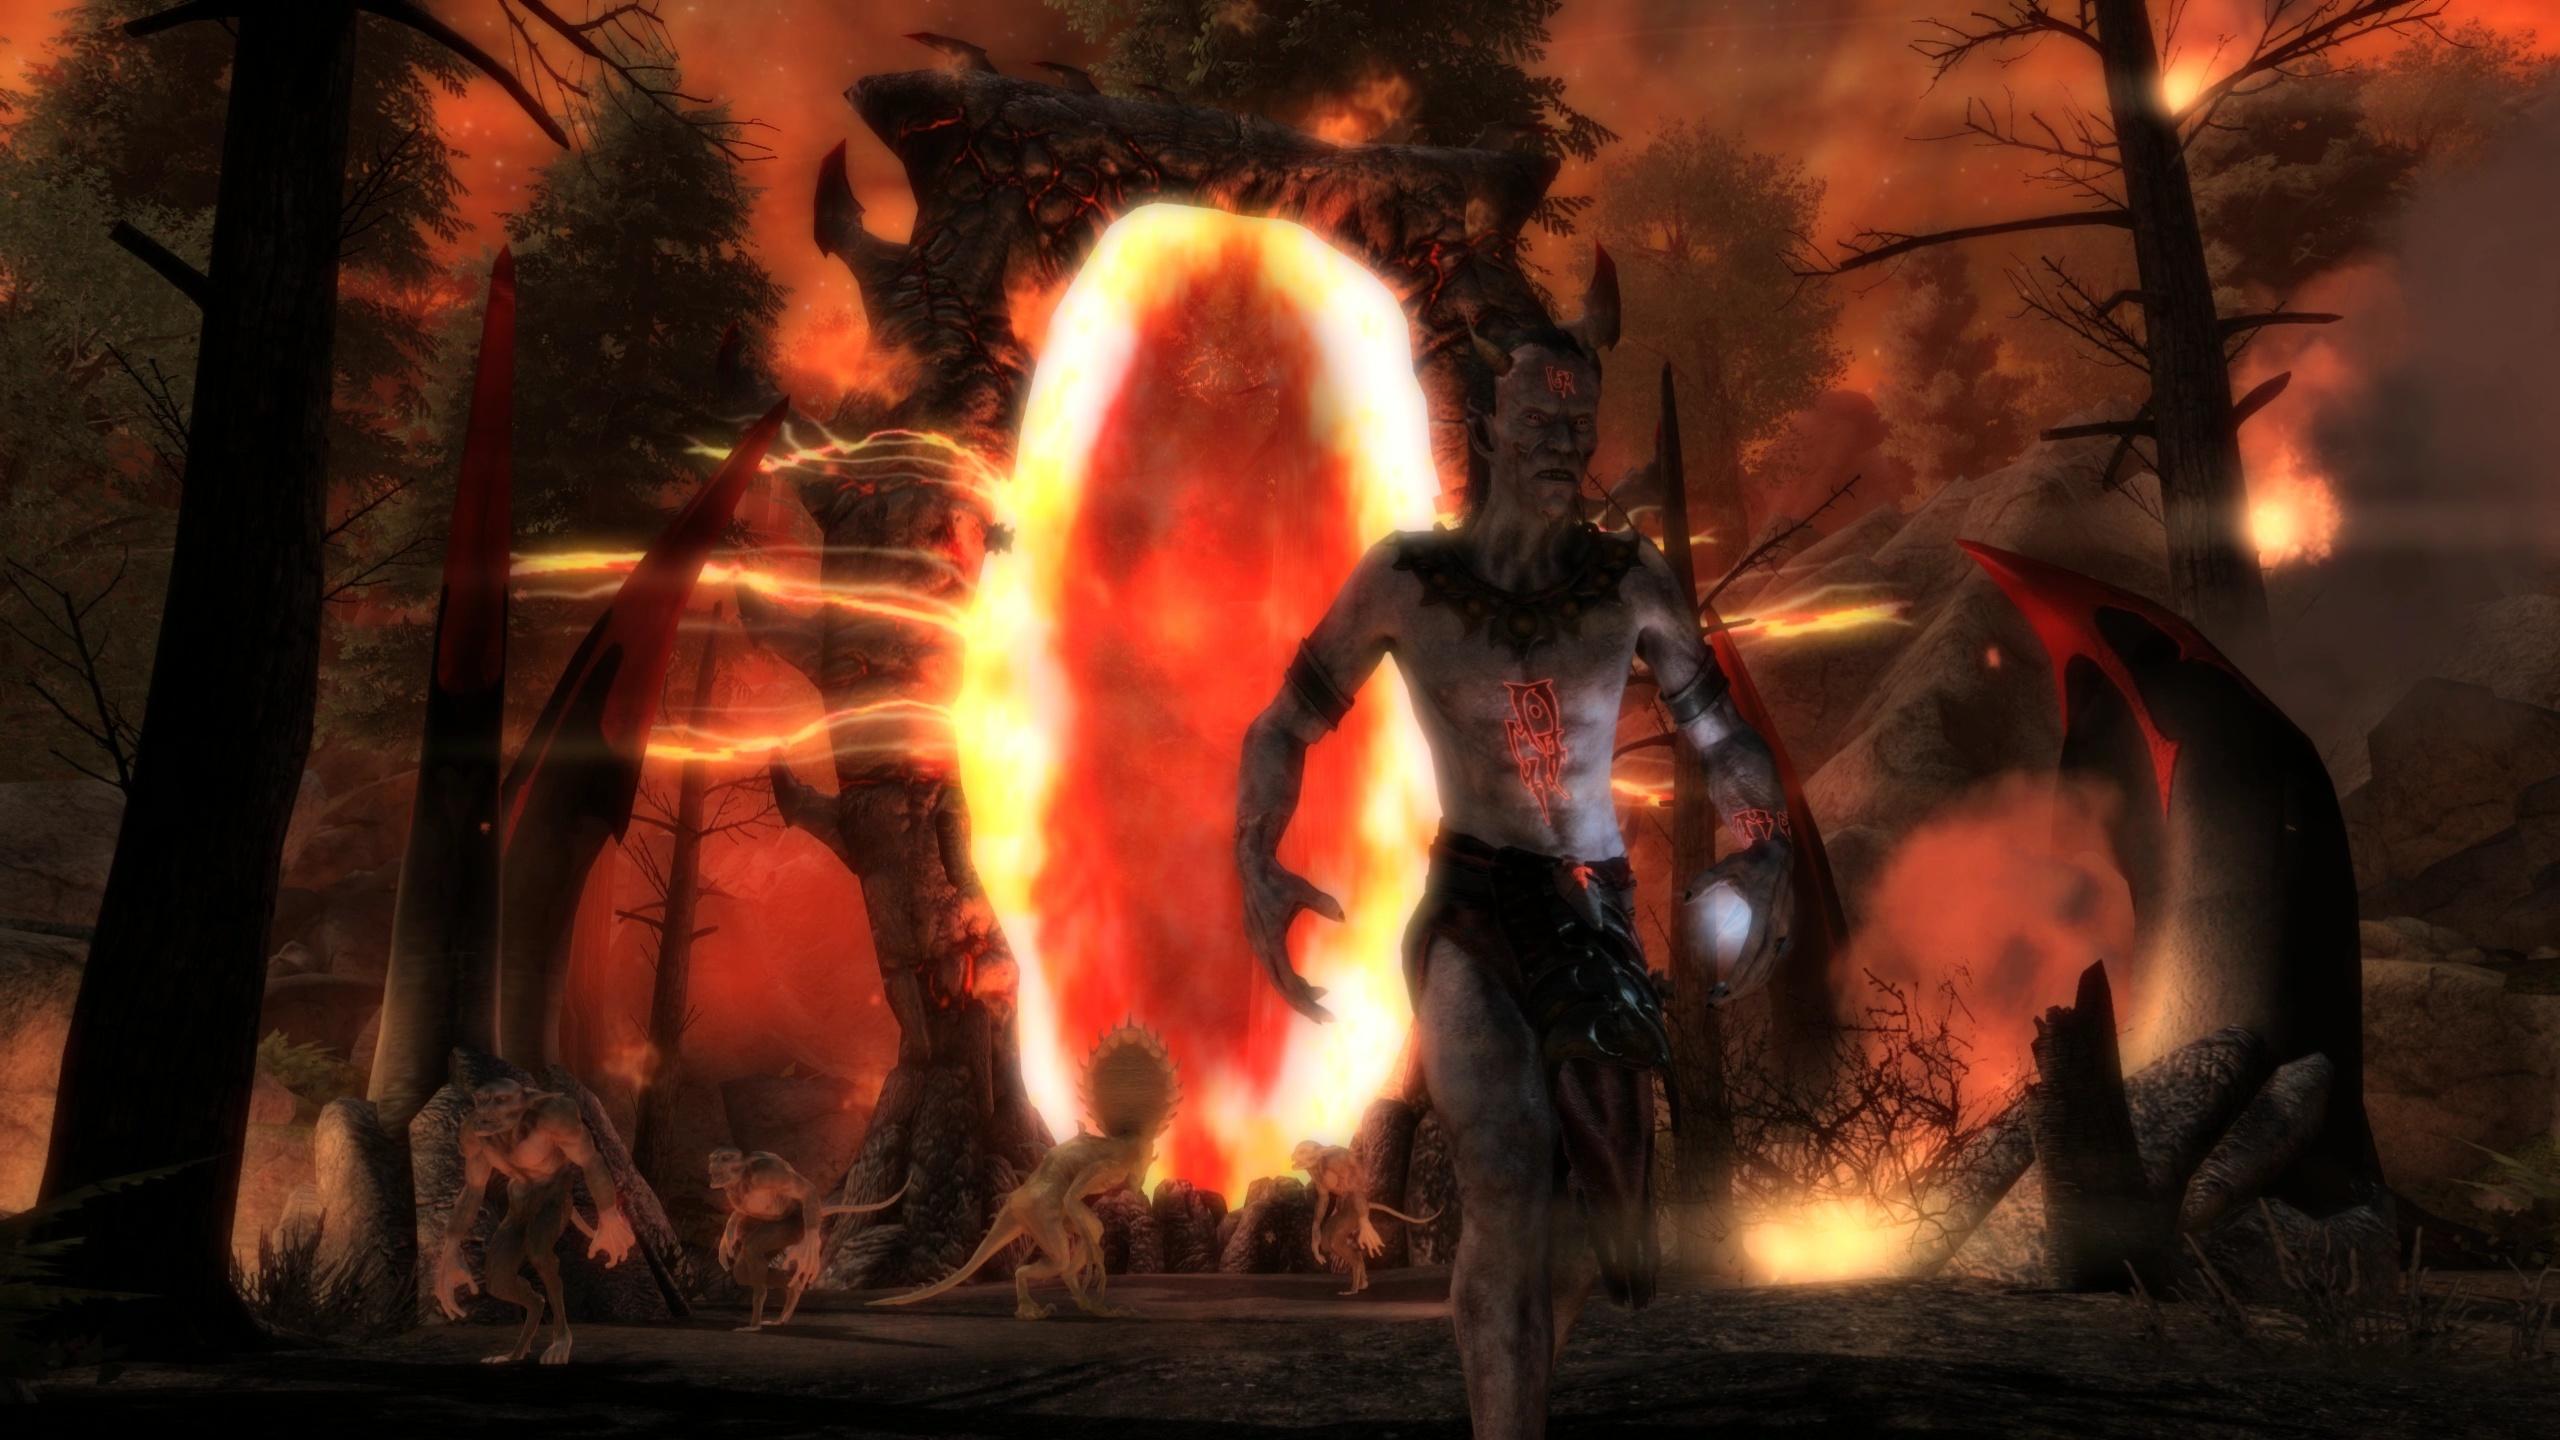 Riesige Oblivion Mod Fur Skyrim Skyblivion Ist Bald Fertig